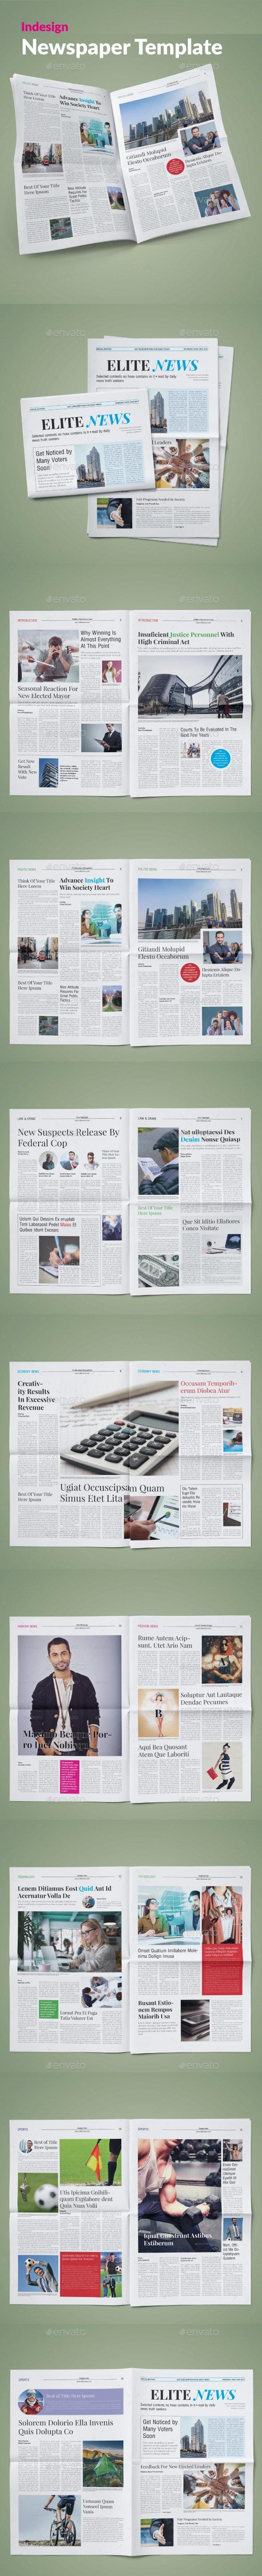 Elite News Newspaper Template